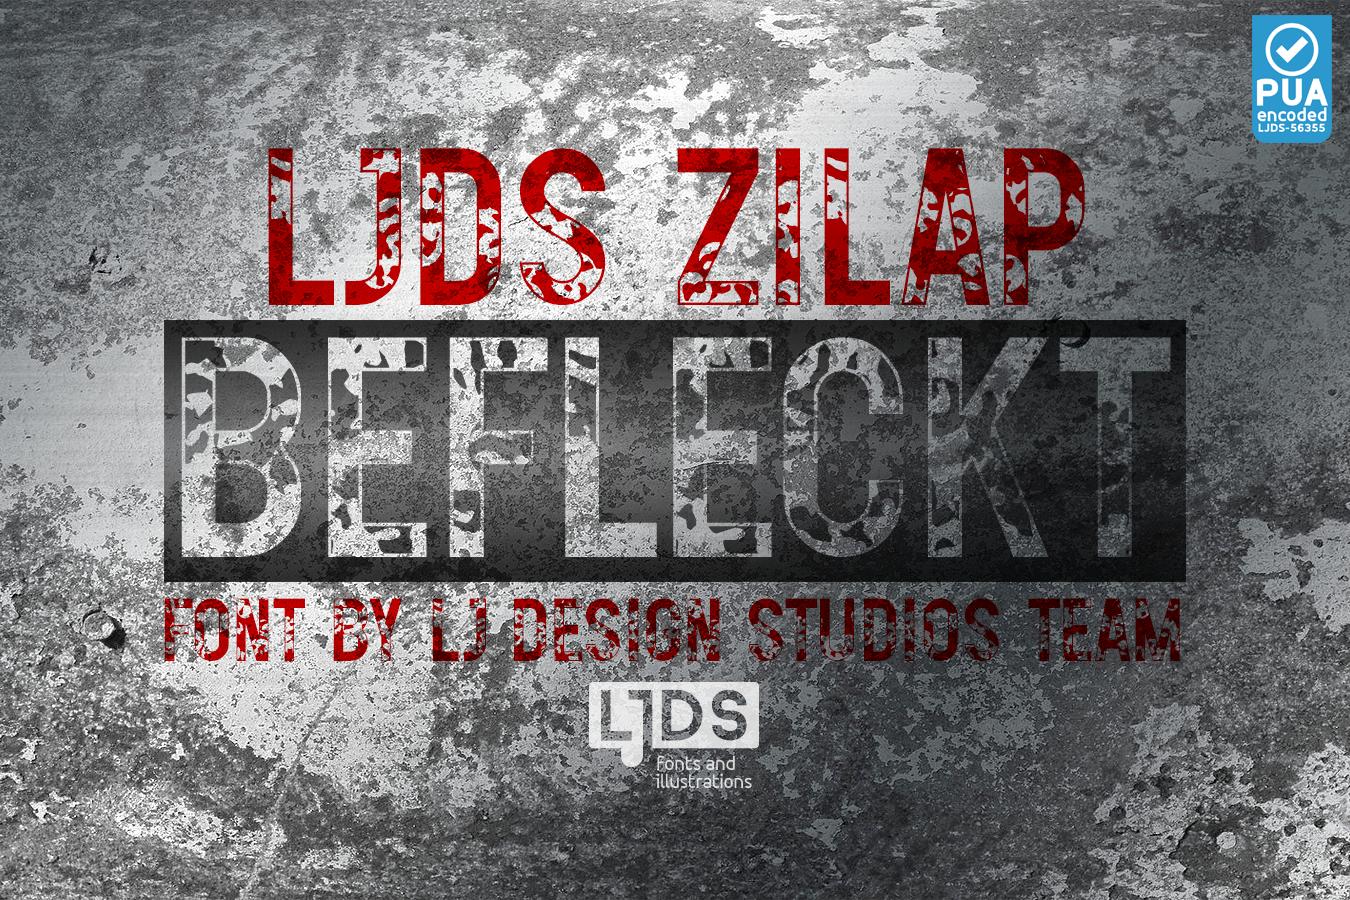 LJDS Zilap Befleckt example image 1